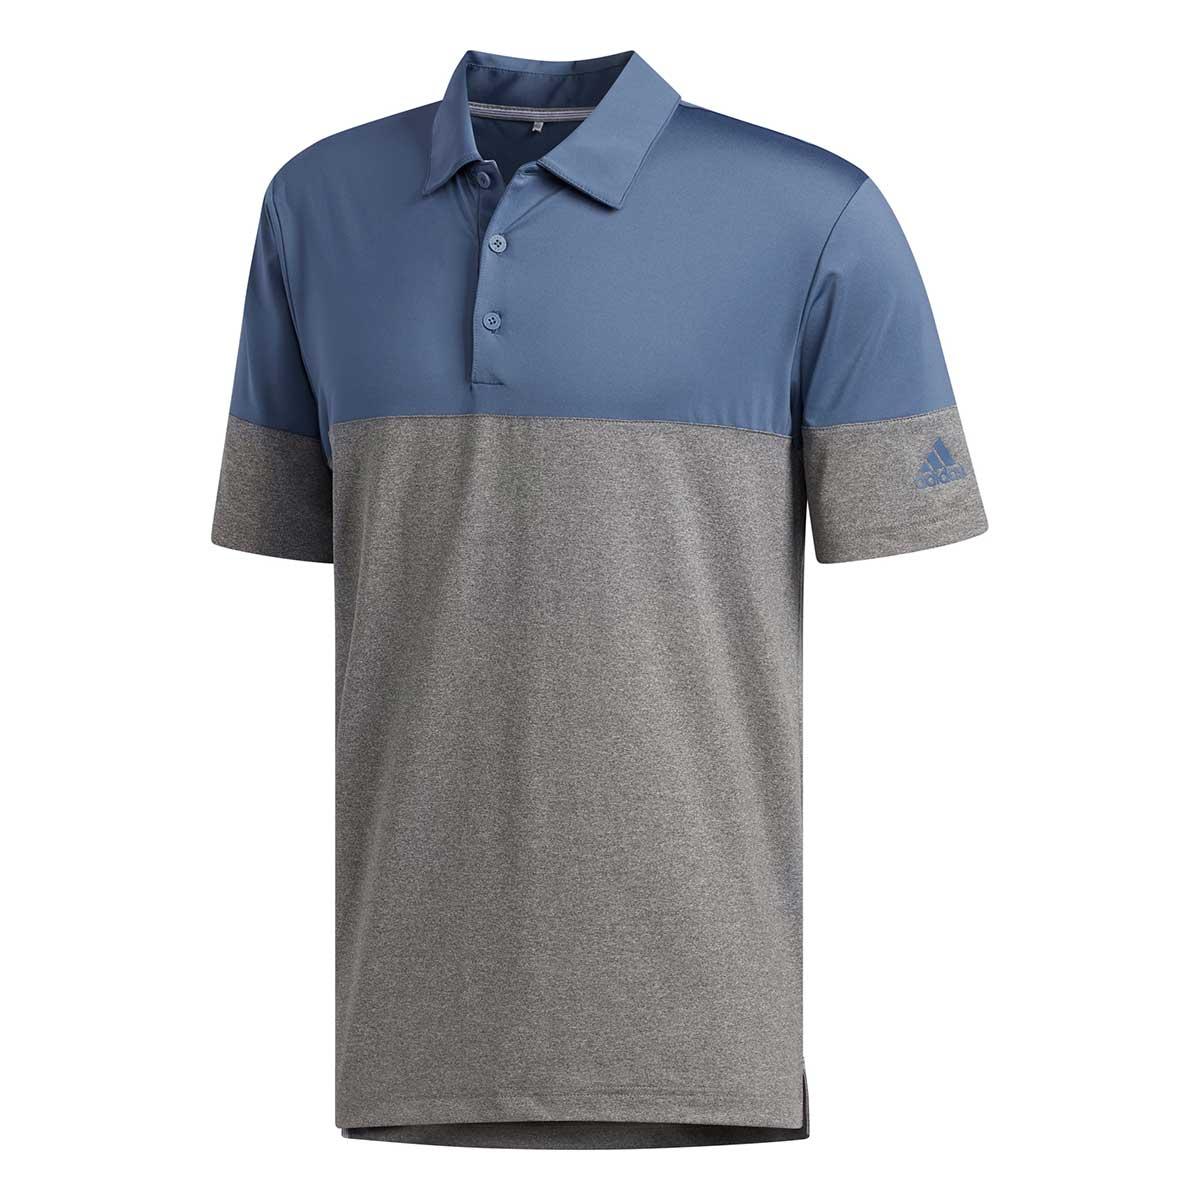 Adidas Men's Ulltimate365 Heathered Blocked Grey Three Polo